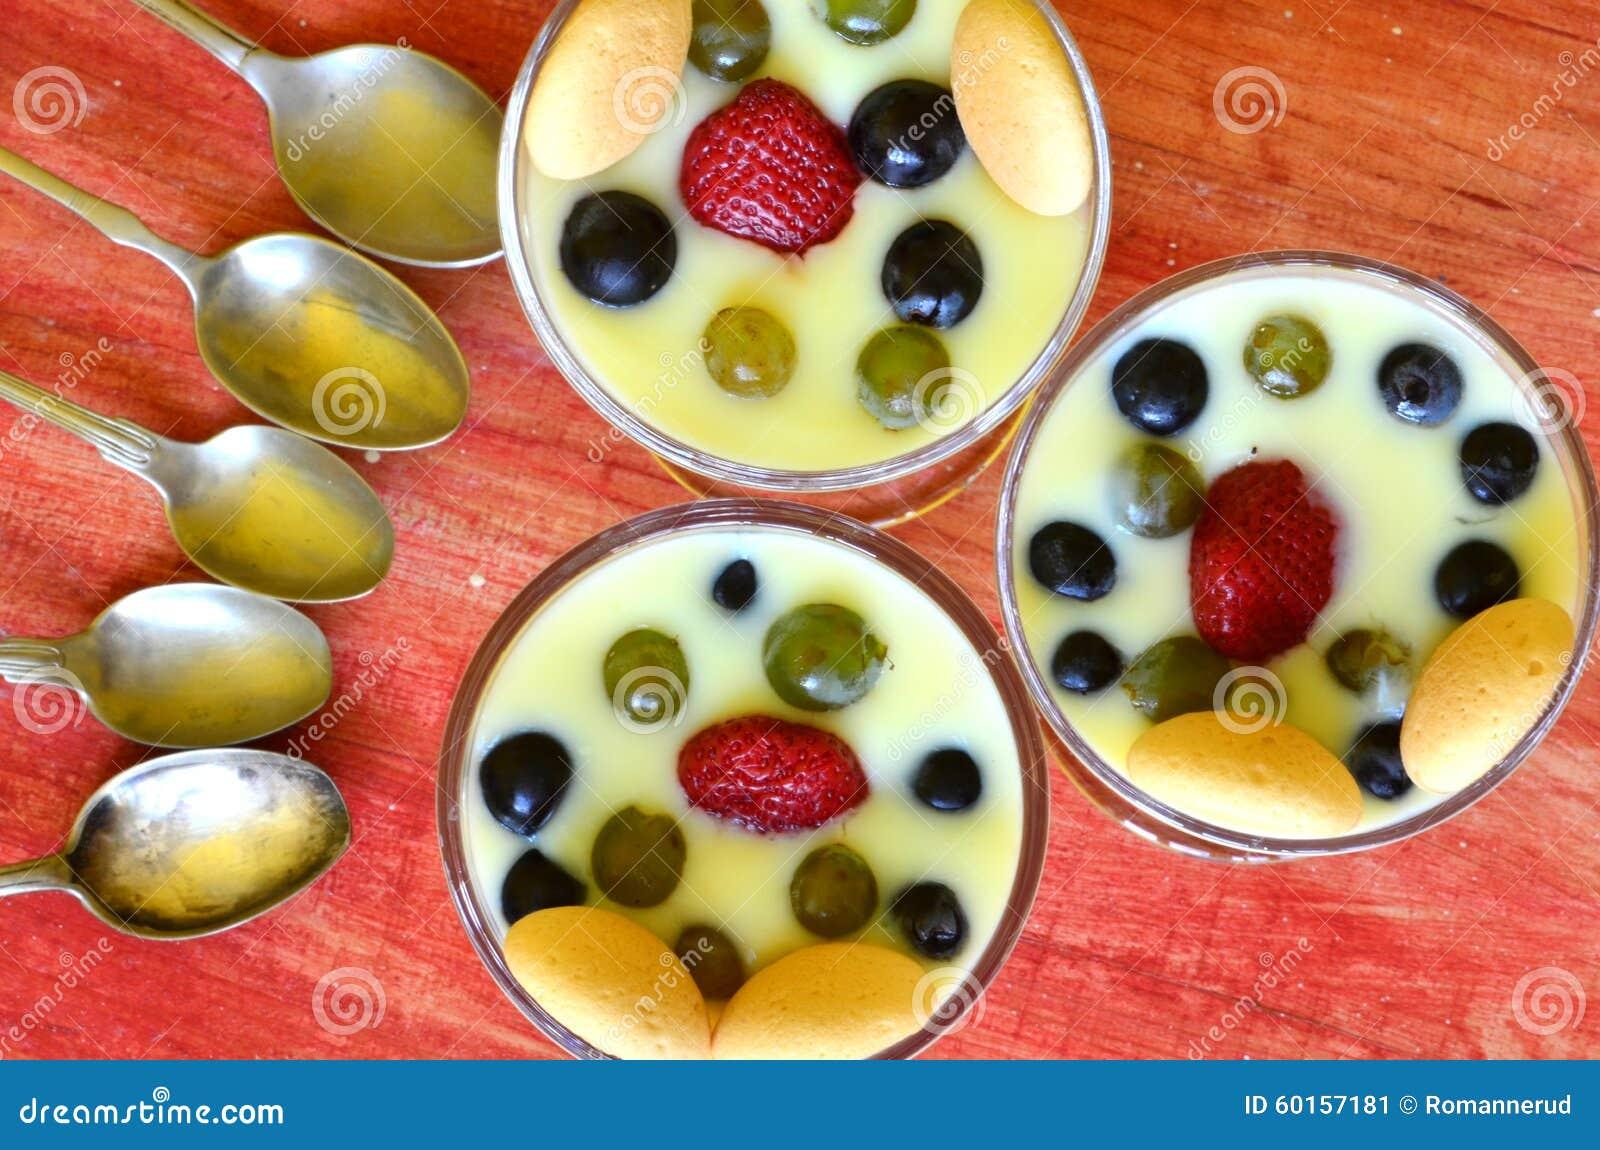 how to make homemade vanilla pudding